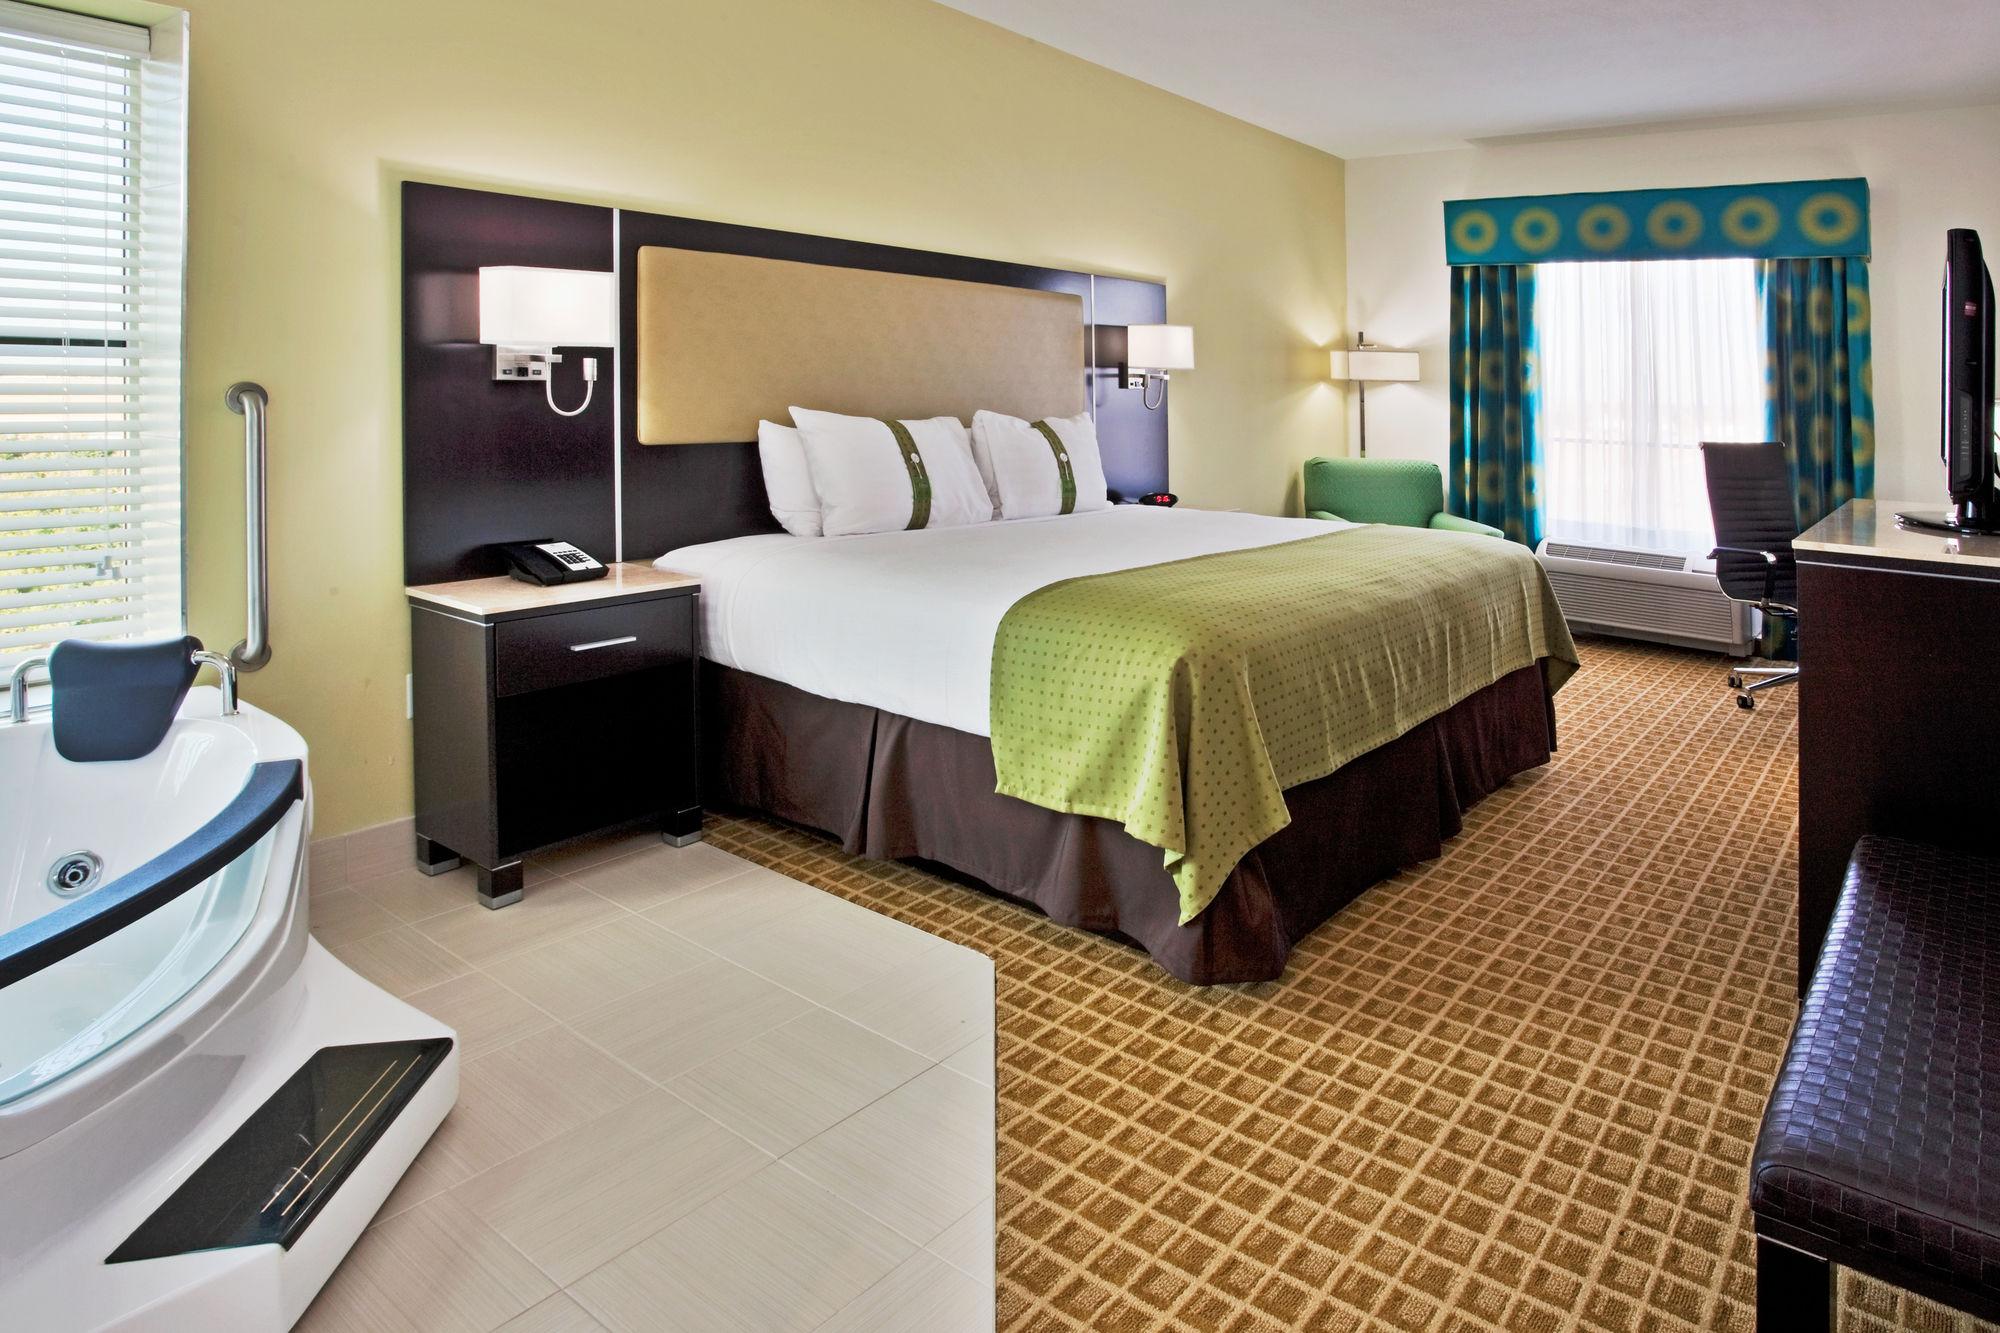 Holiday Inn Sarasota Airport in Sarasota, FL